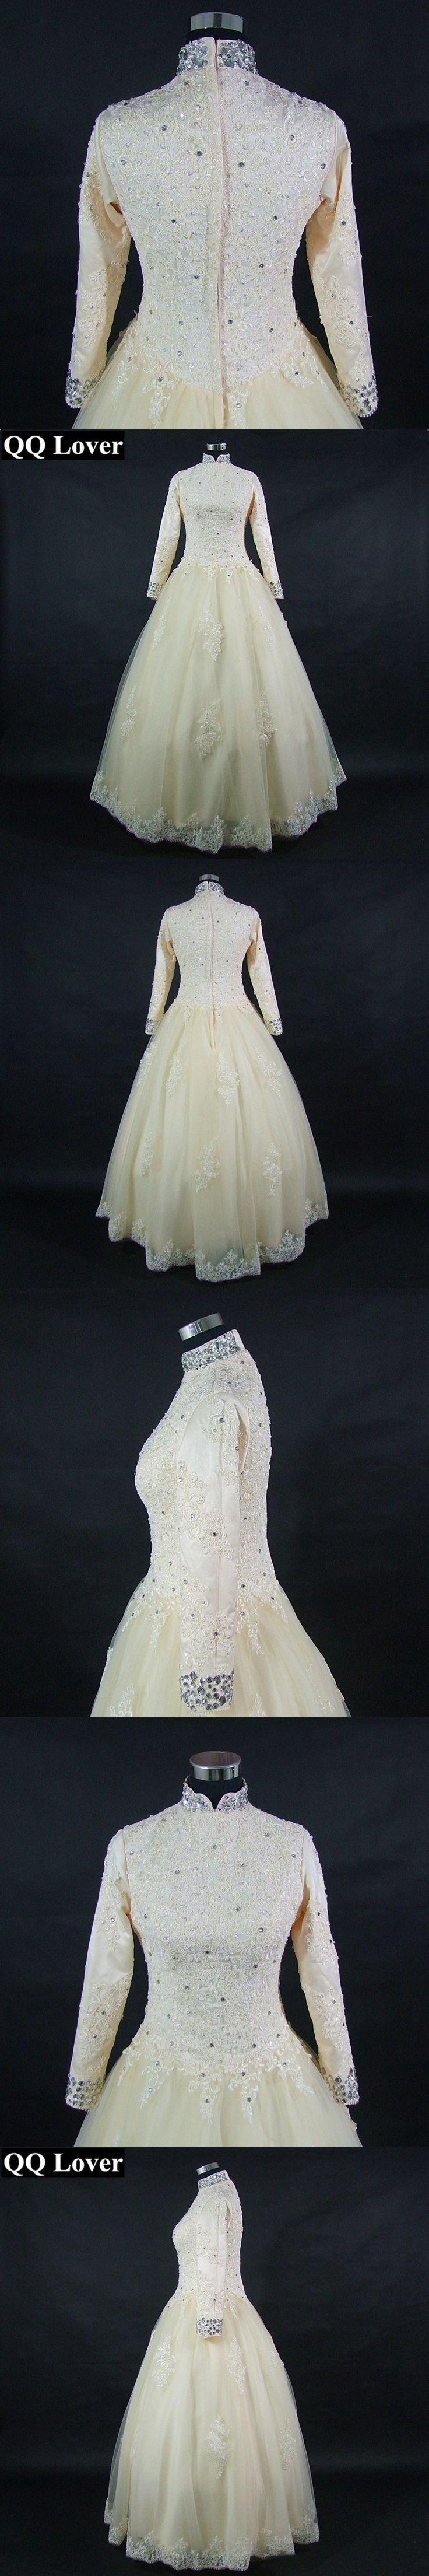 QQ Lover 2018 New Champagne Wedding Dress Long Sleeves Lace Vestido De Noiva Custom-made Plus Size Wedding Gown Bridal Dress